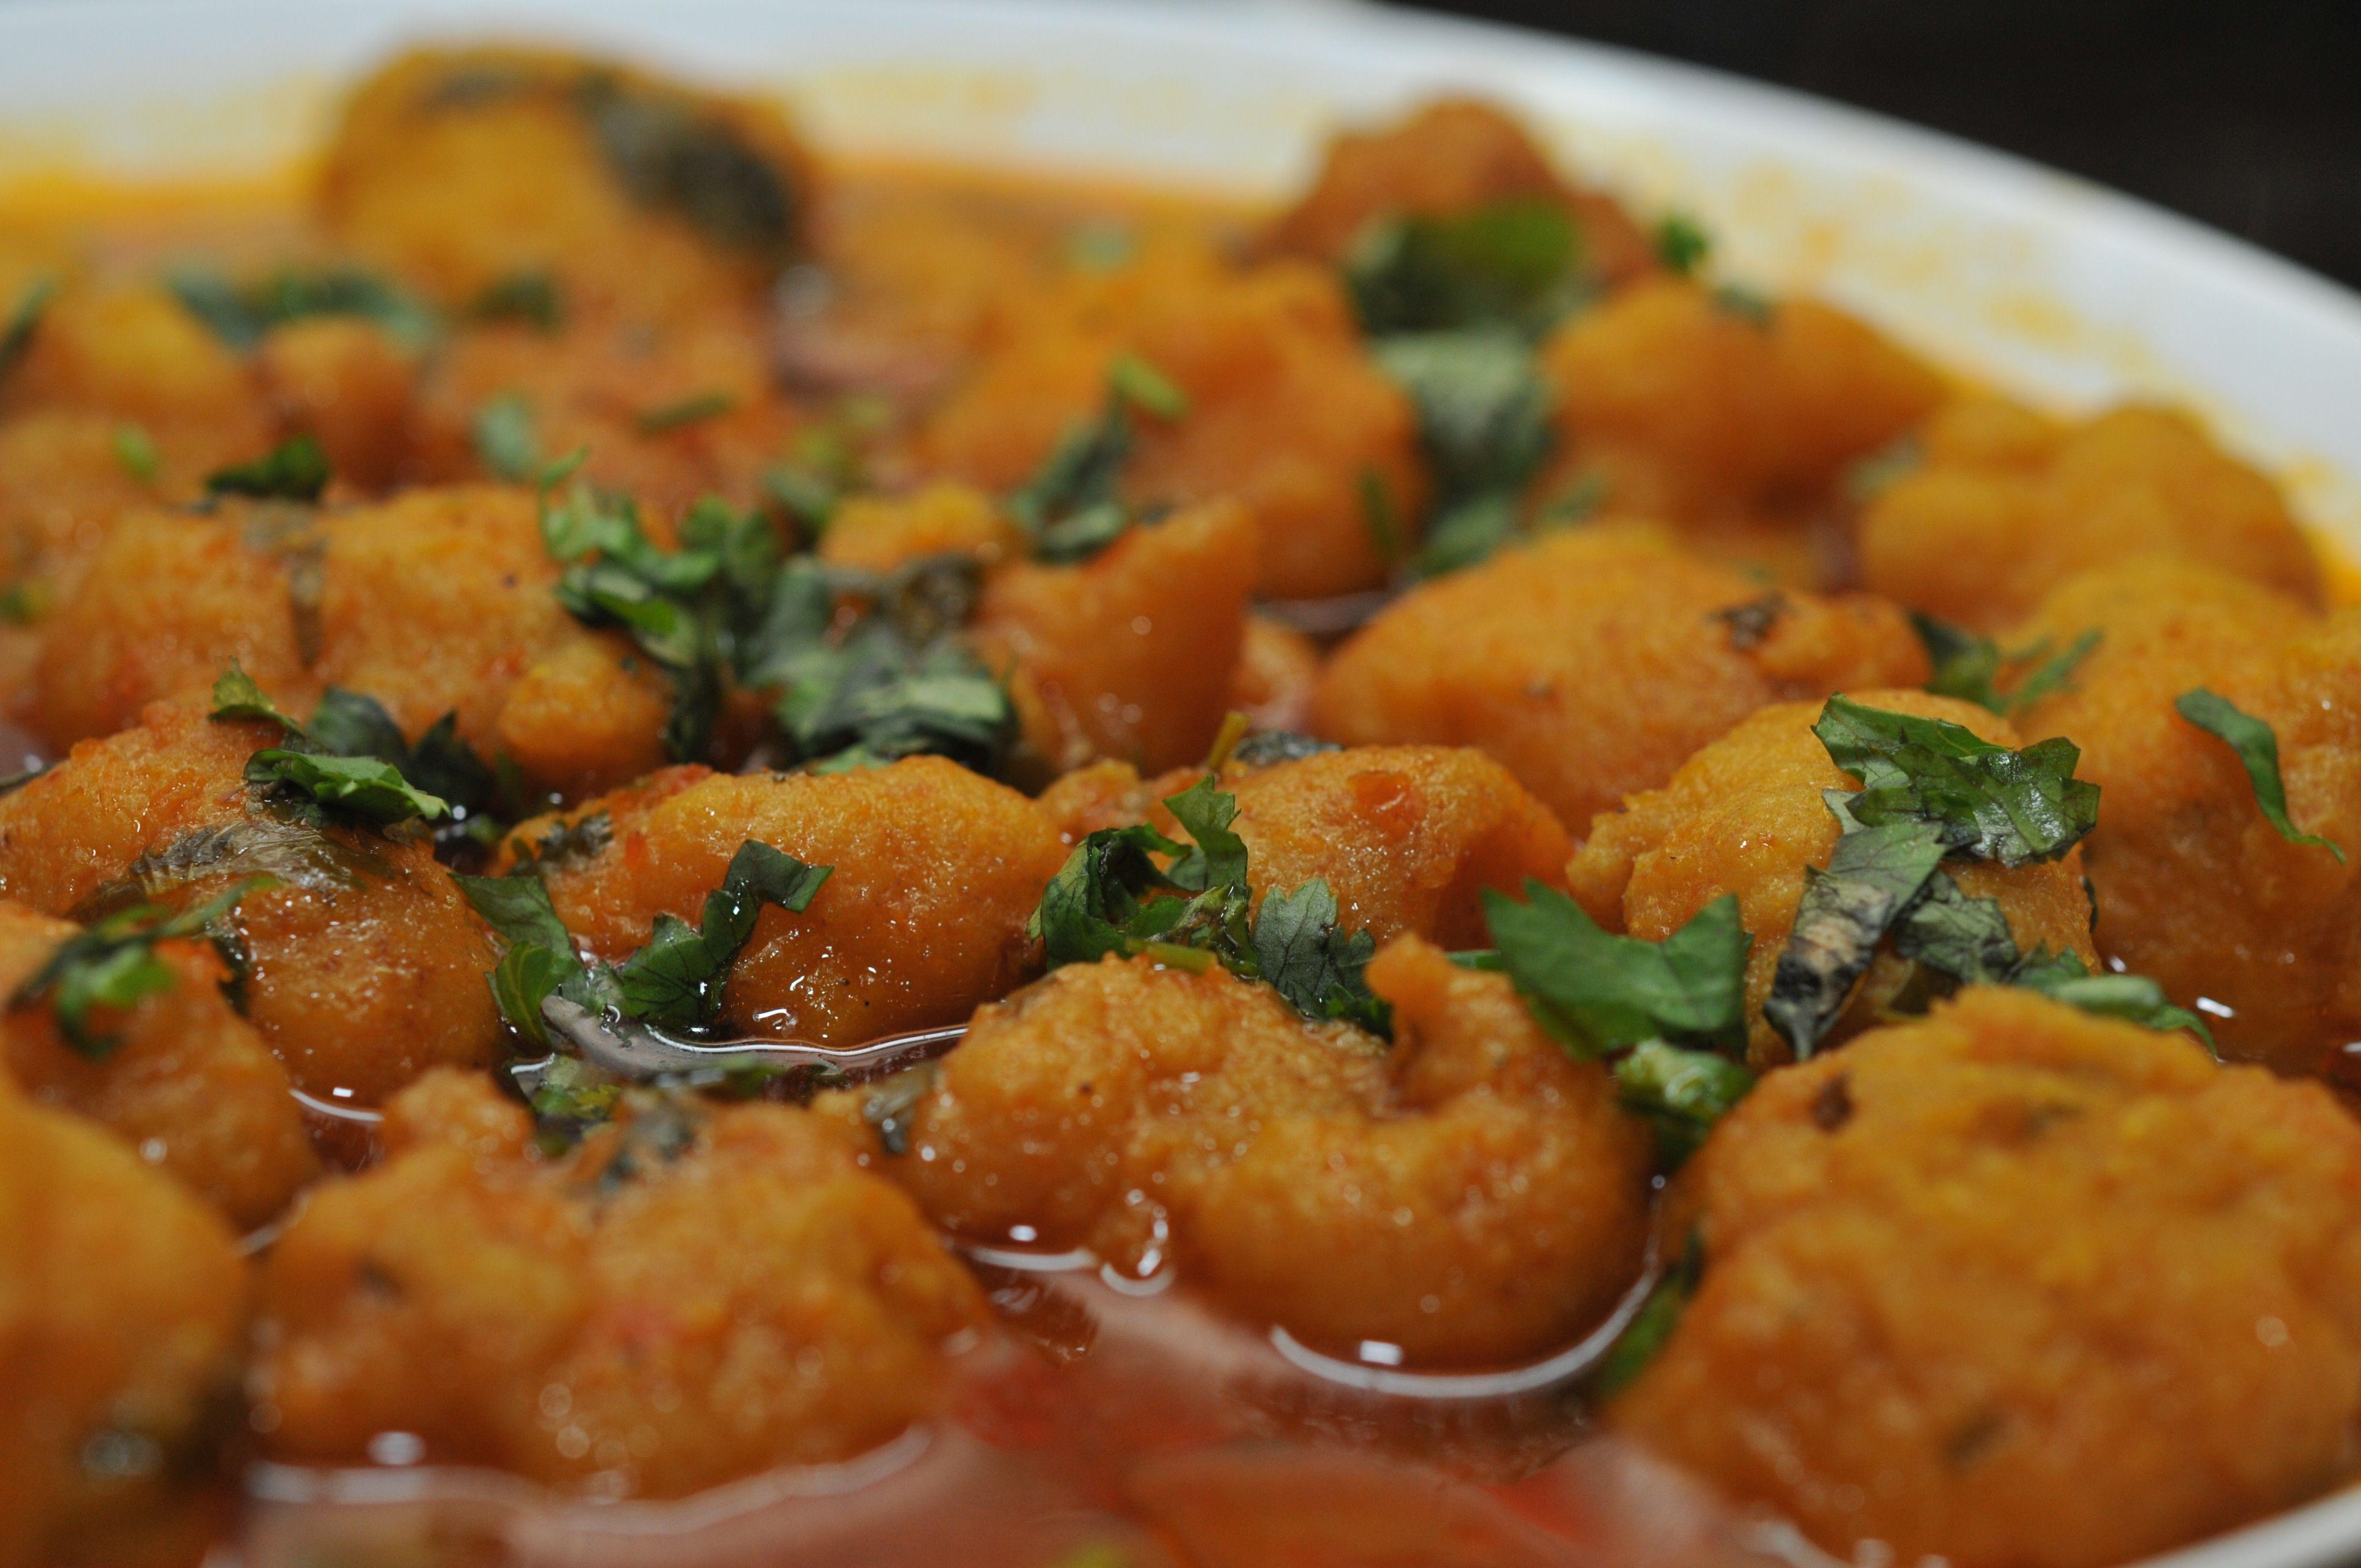 Indian pahari himachali recipes the restaurant fairys kitchen indian pahari himachali recipes the restaurant fairys kitchen forumfinder Gallery